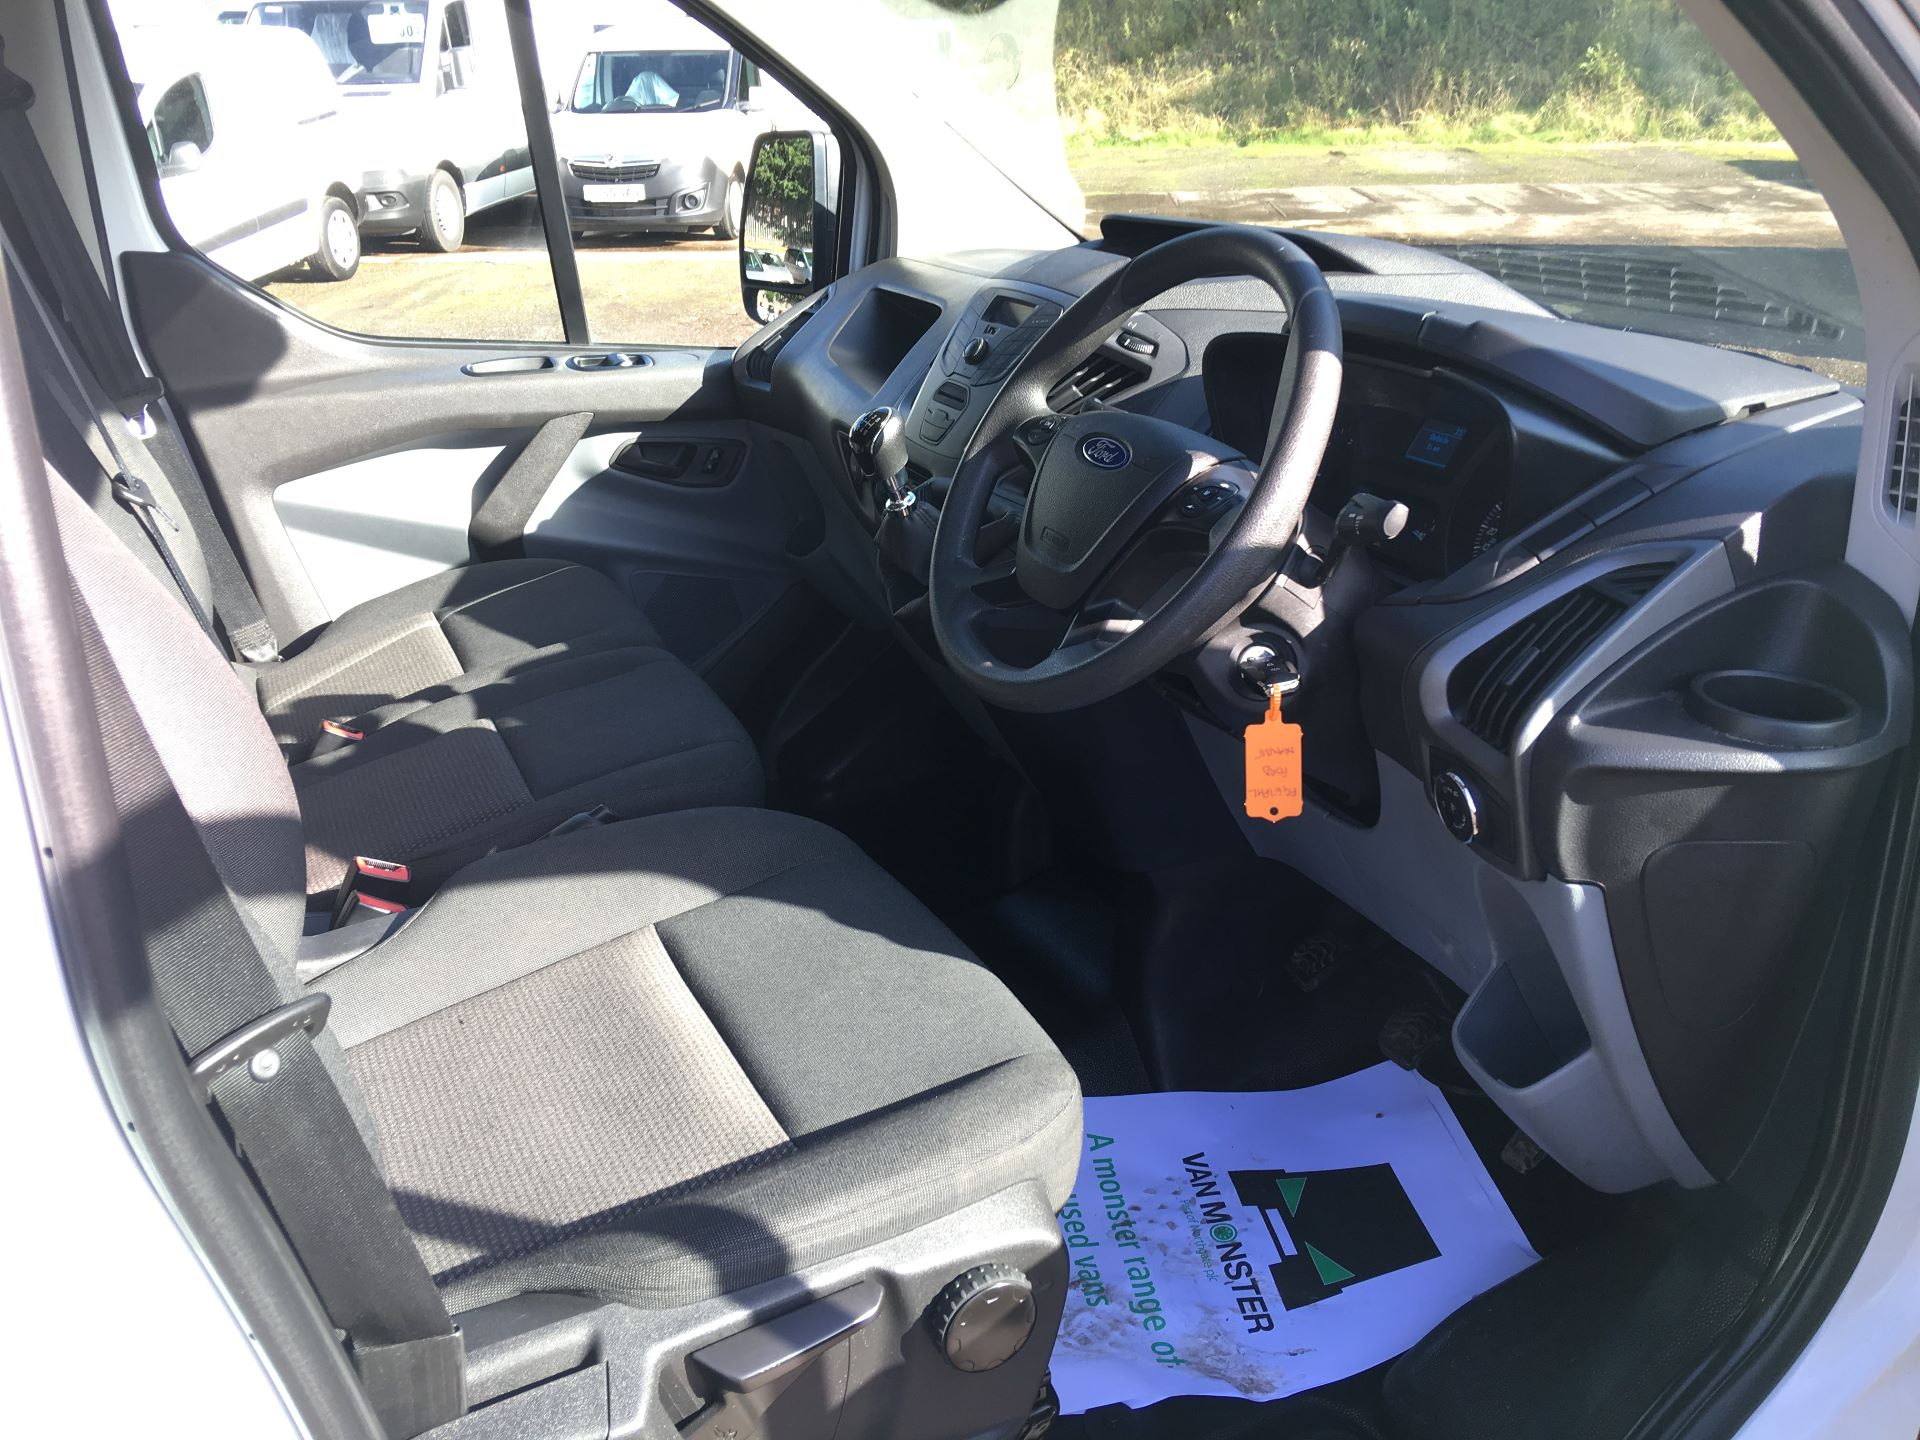 2017 Ford Transit Custom 290 L1 DIESEL FWD 2.0 TDCI 105PS LOW ROOF VAN EURO 6 (FG67FHL) Image 2